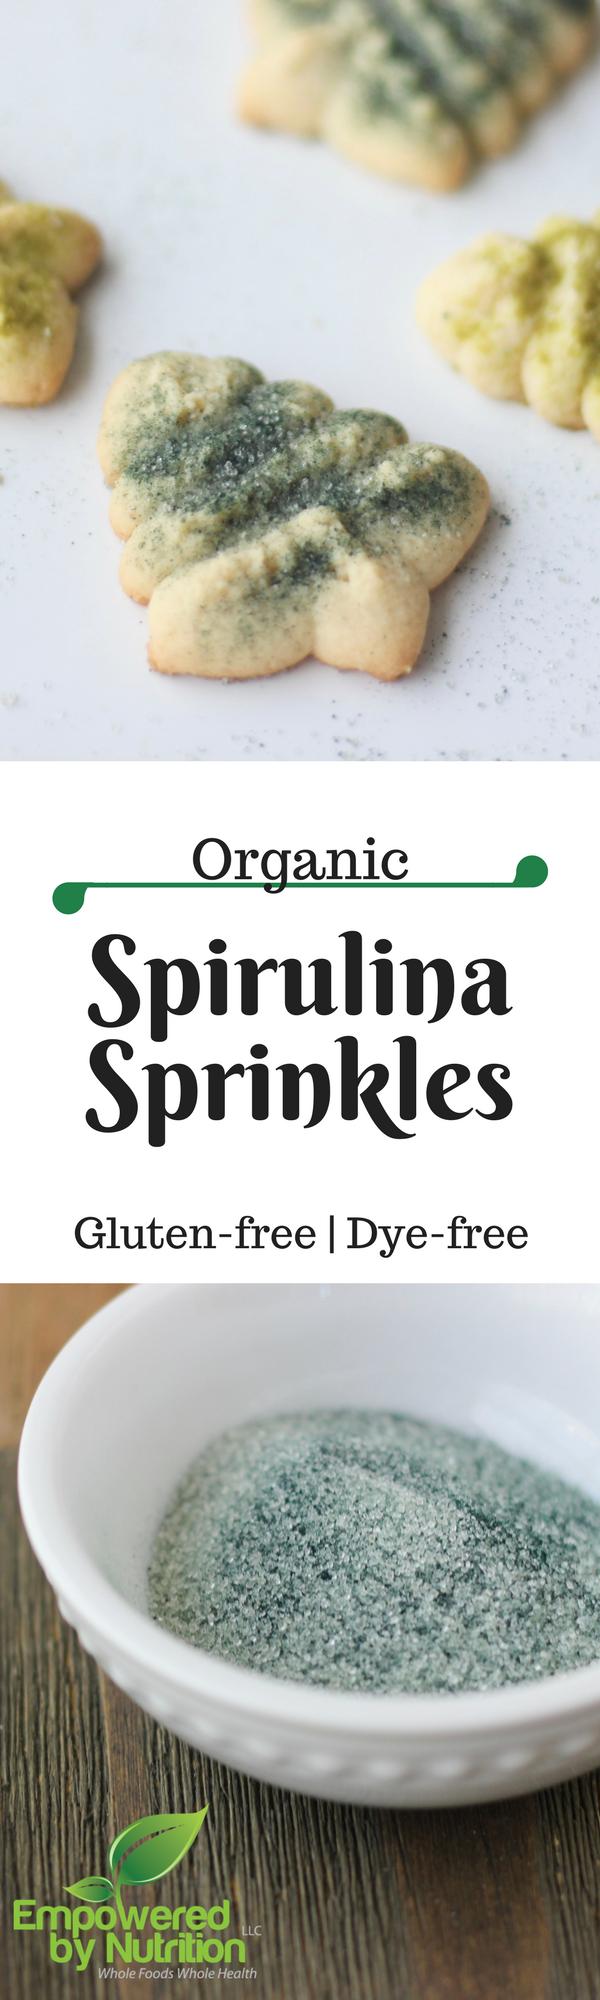 gluten-free organic spirulina sprinkles